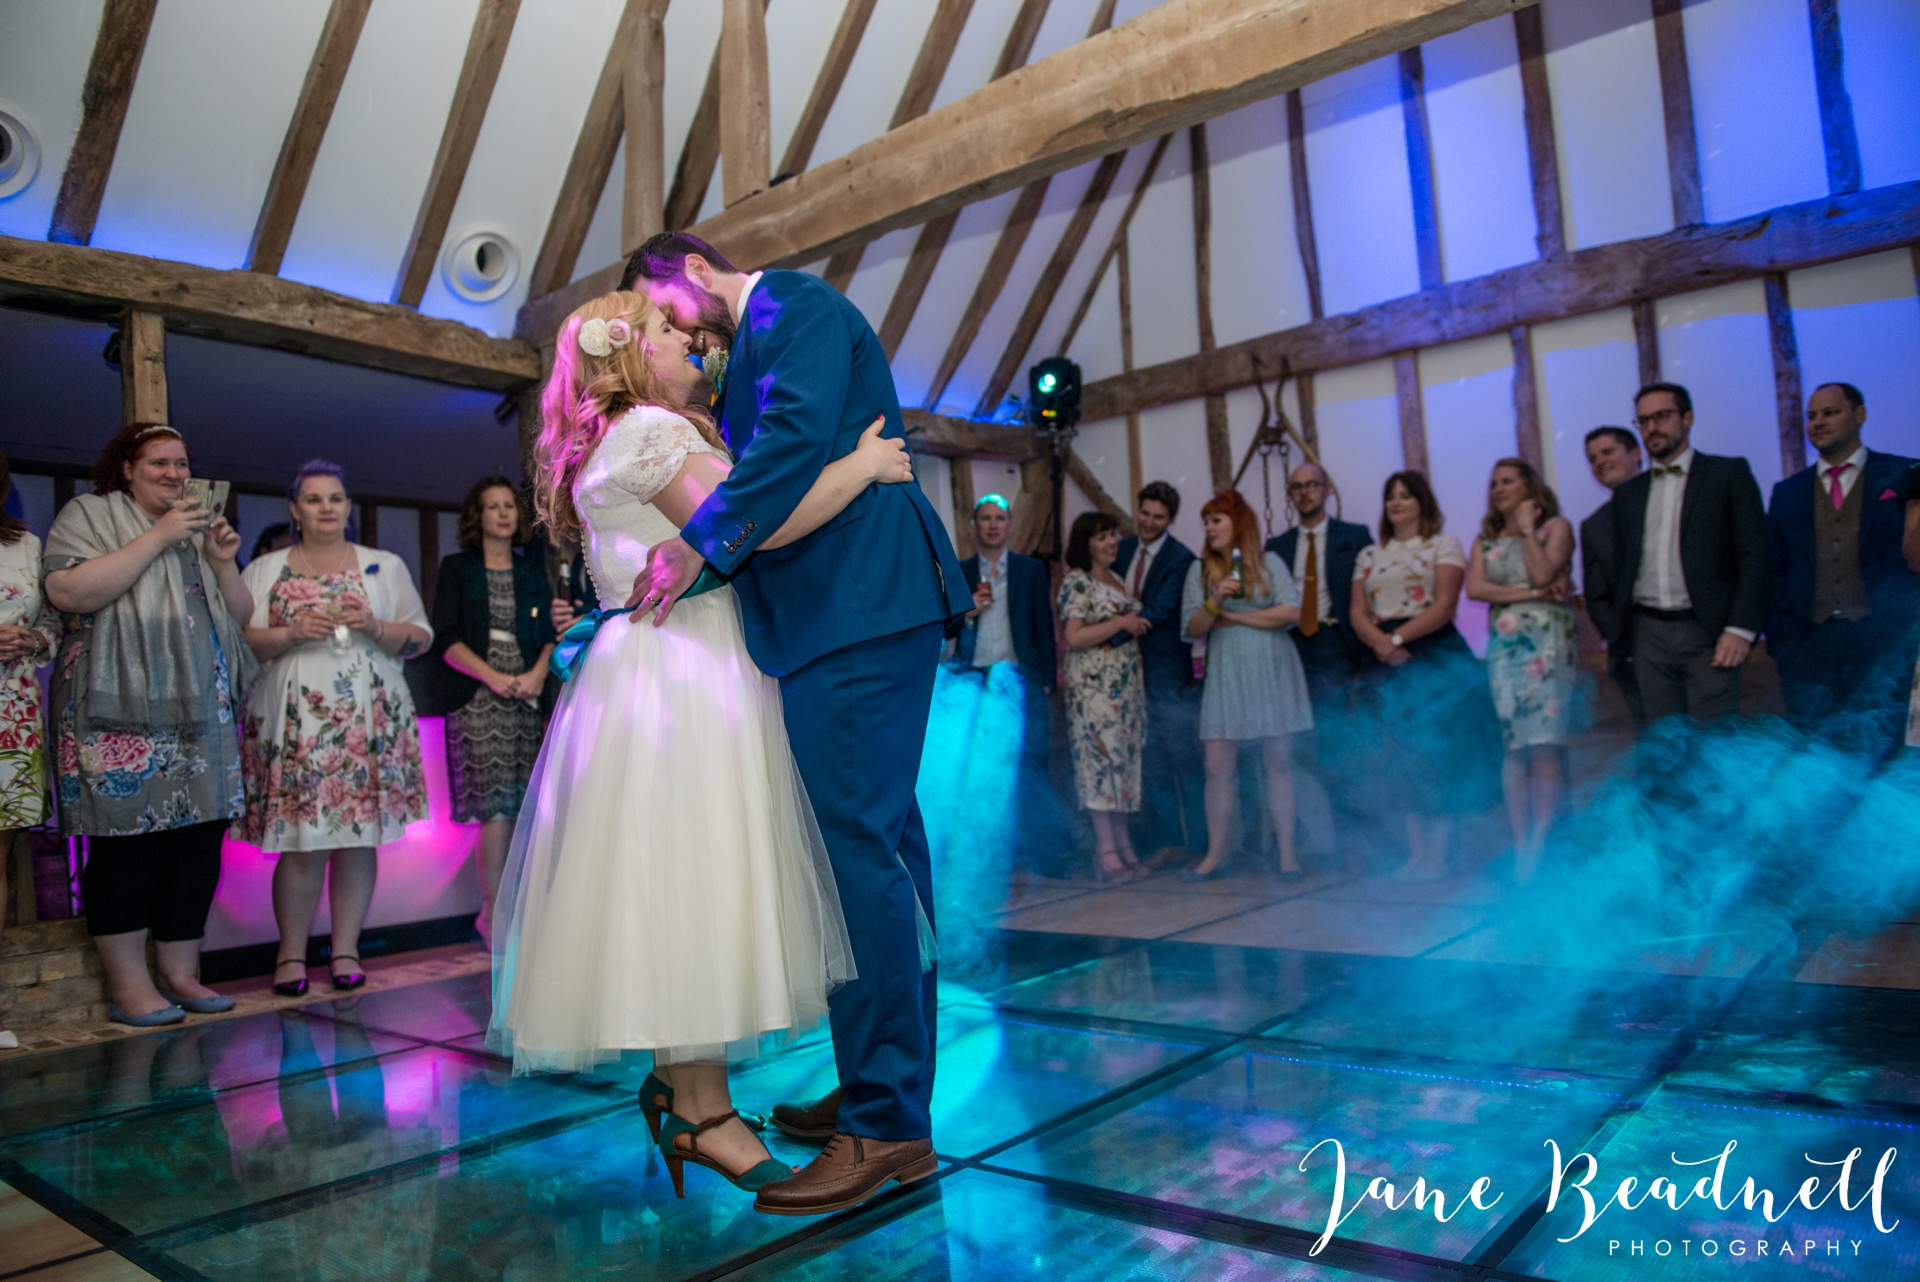 South Farm Wedding photography Hertfordshire by Jane Beadnell Photography fine art wedding photographer_0211